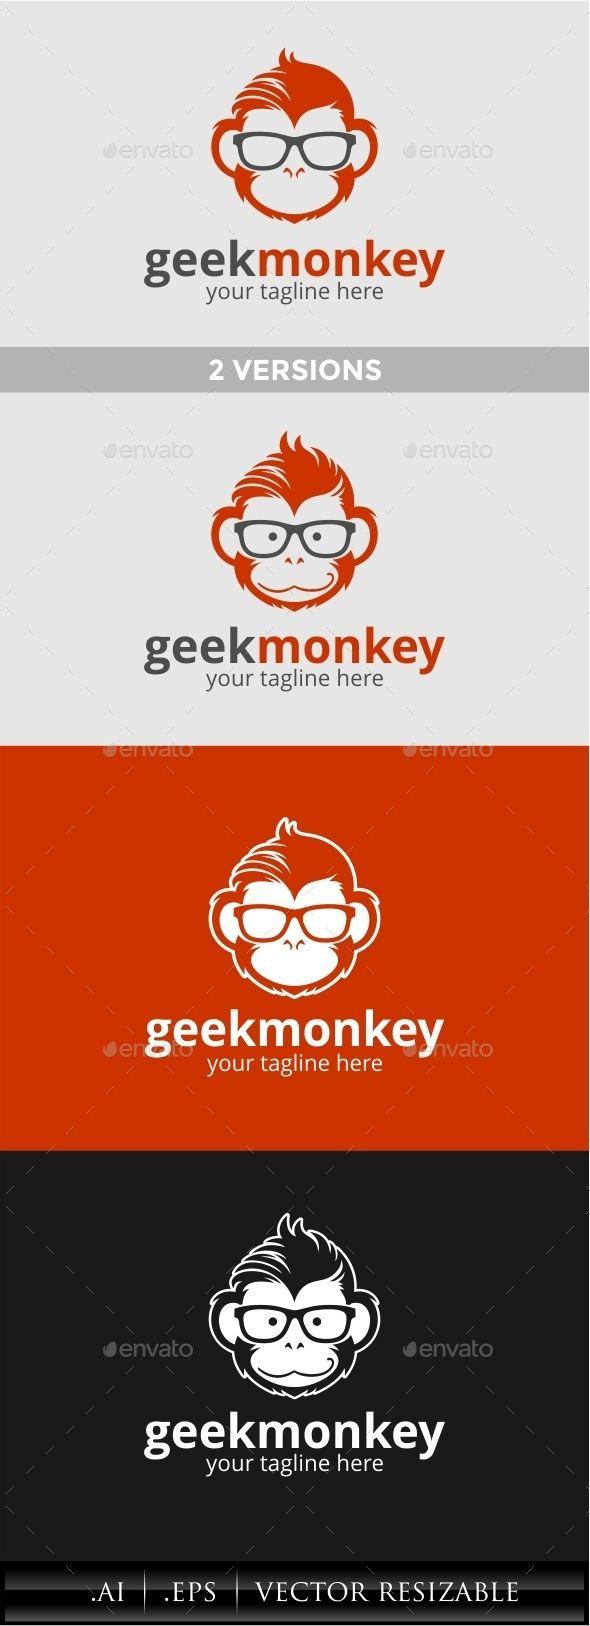 Geek Monkey Logo Template Vector EPS, AI #logotype Download: http://graphicriver.net/item/geek-monkey-logo/11451817?ref=ksioks